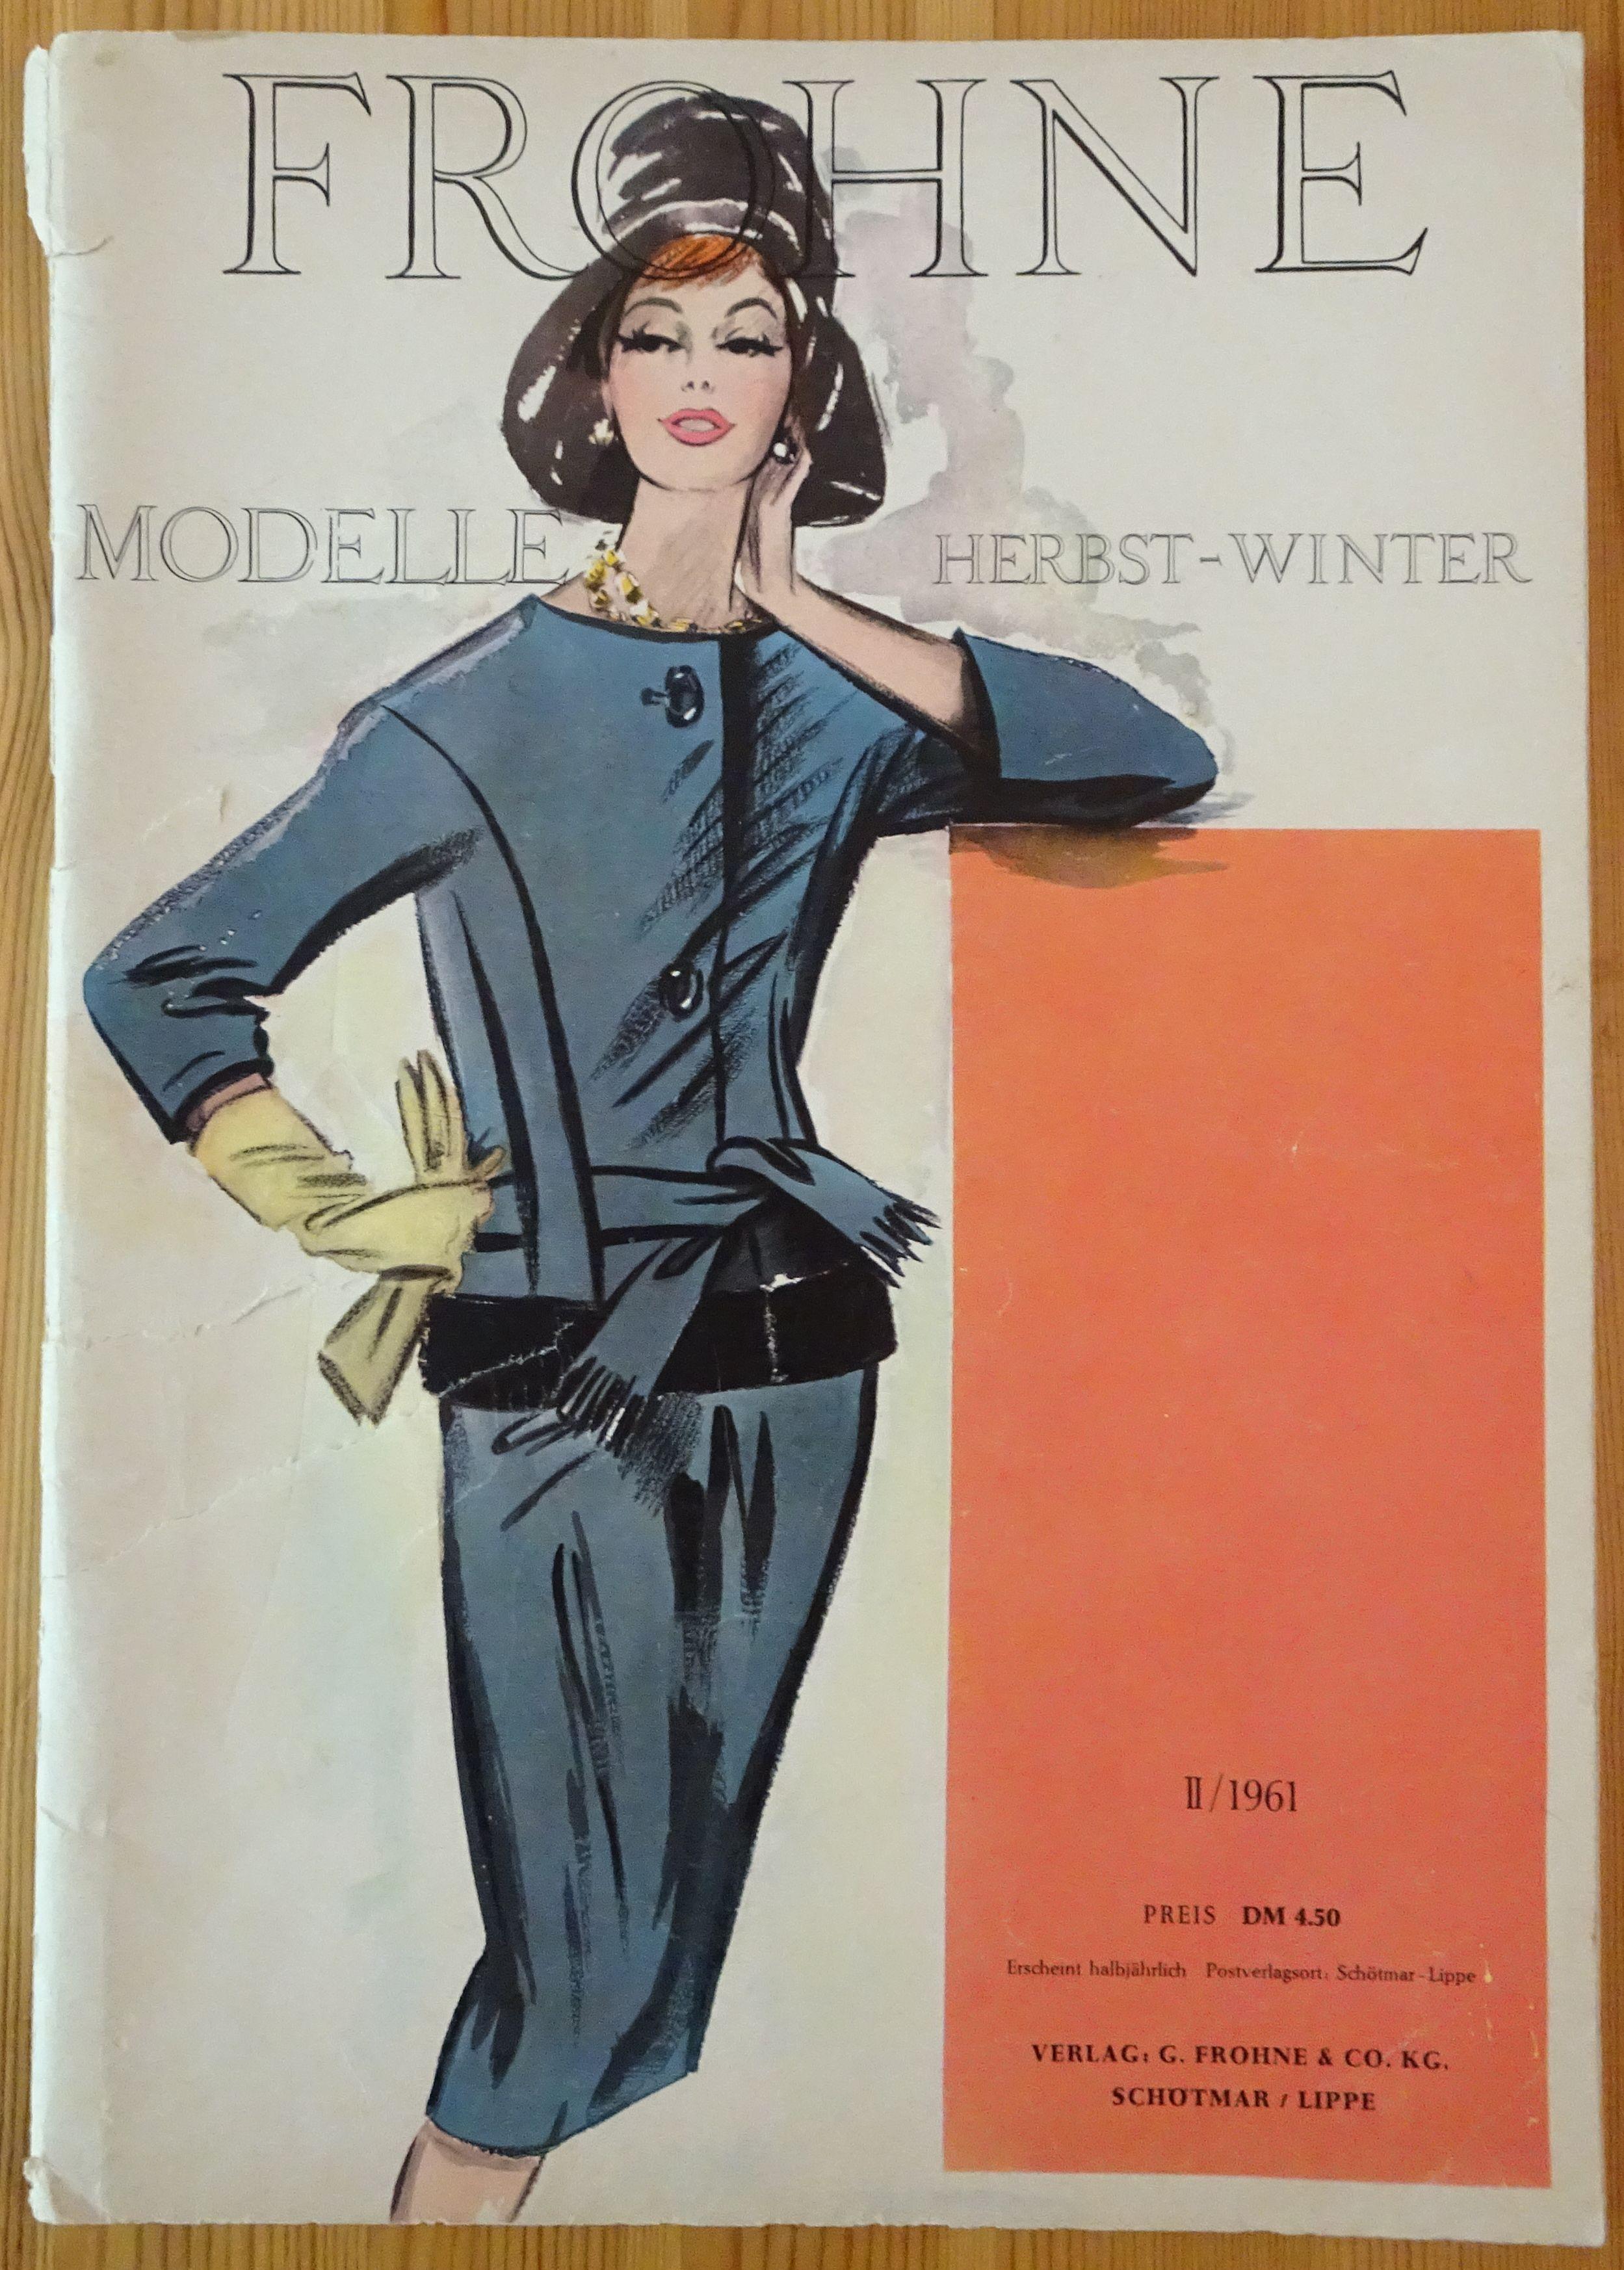 Frohne Modelle 2/1961